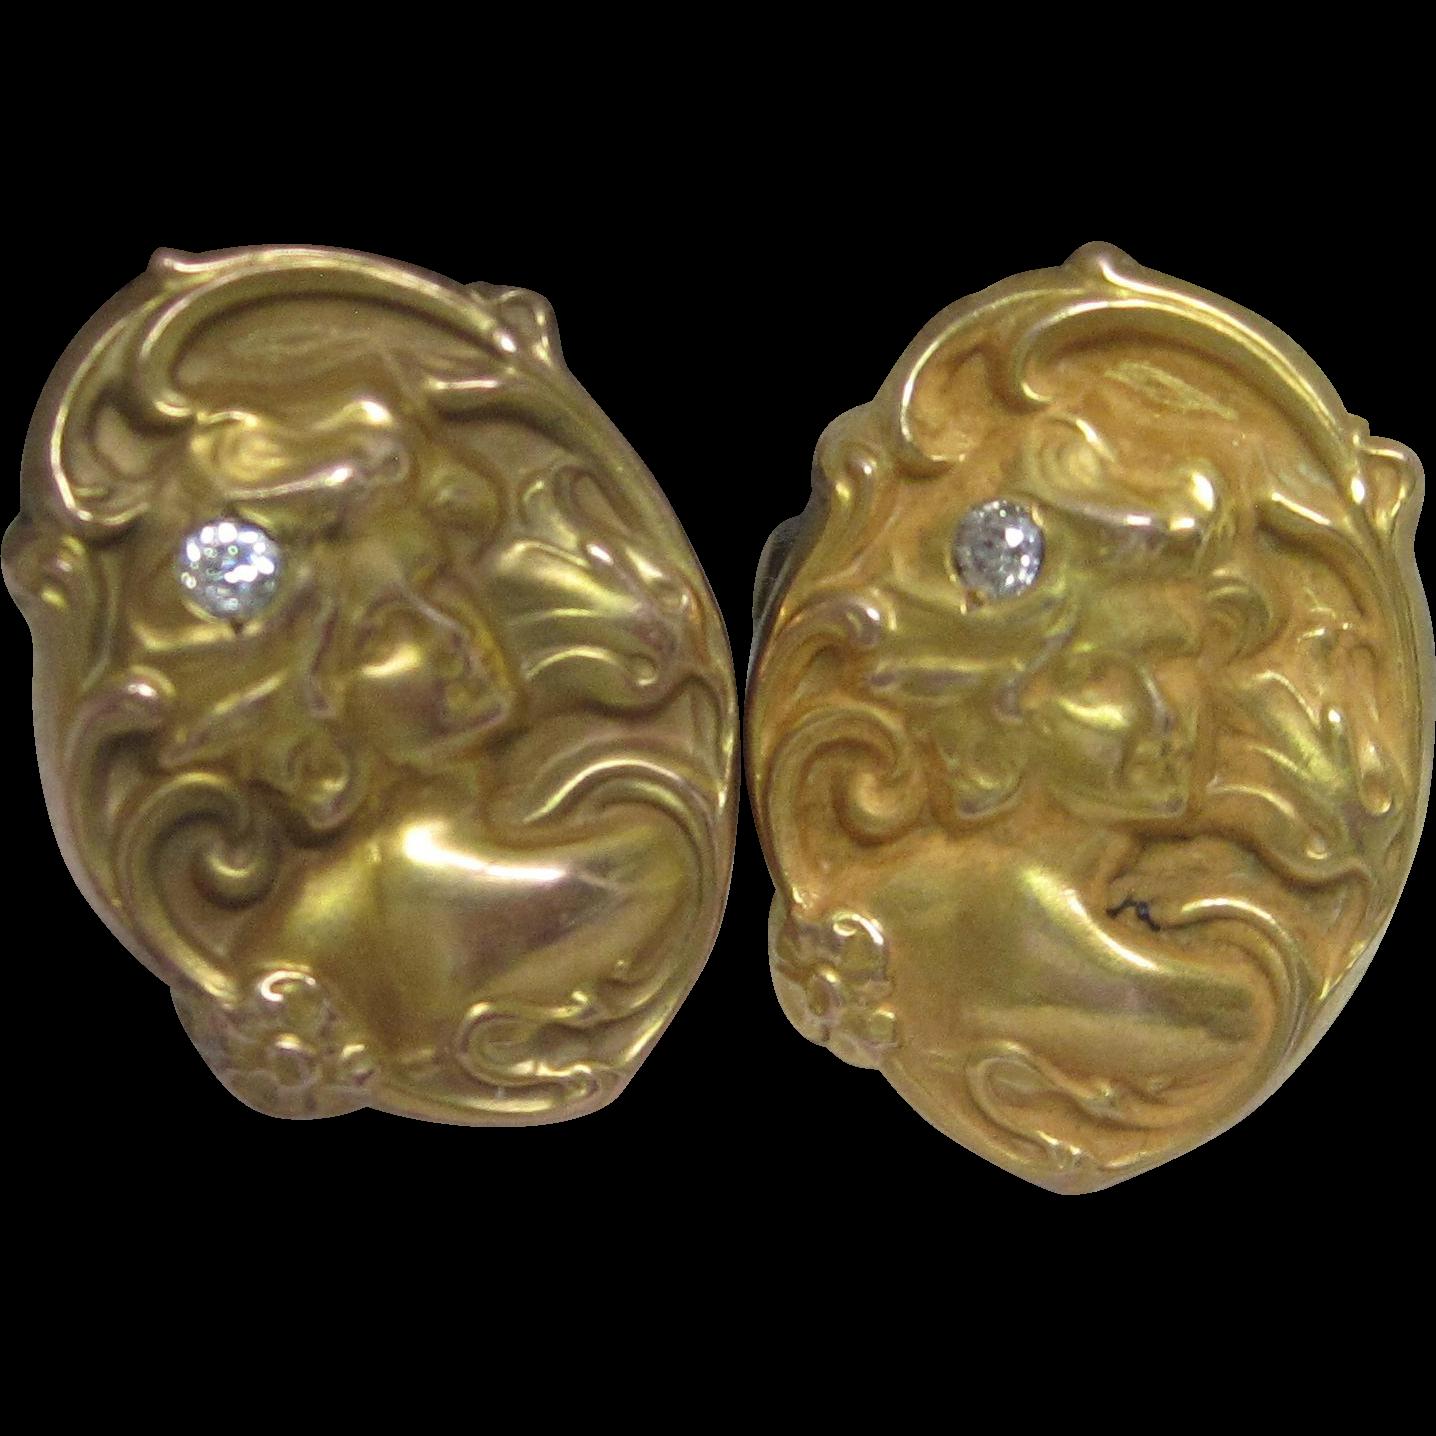 Art Nouveau Diamond Cufflinks in 10K Yellow Gold